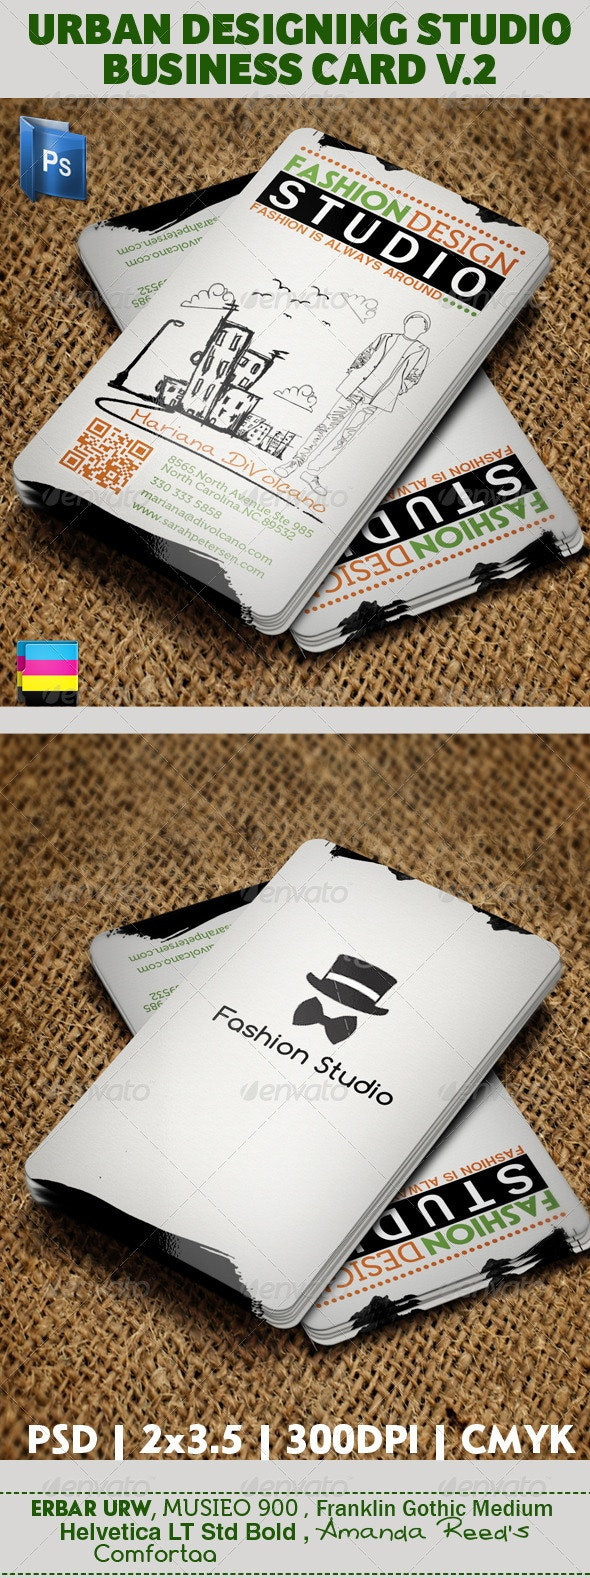 Urban Fashion Studio Business Card V2 - Business Cards Print Templates